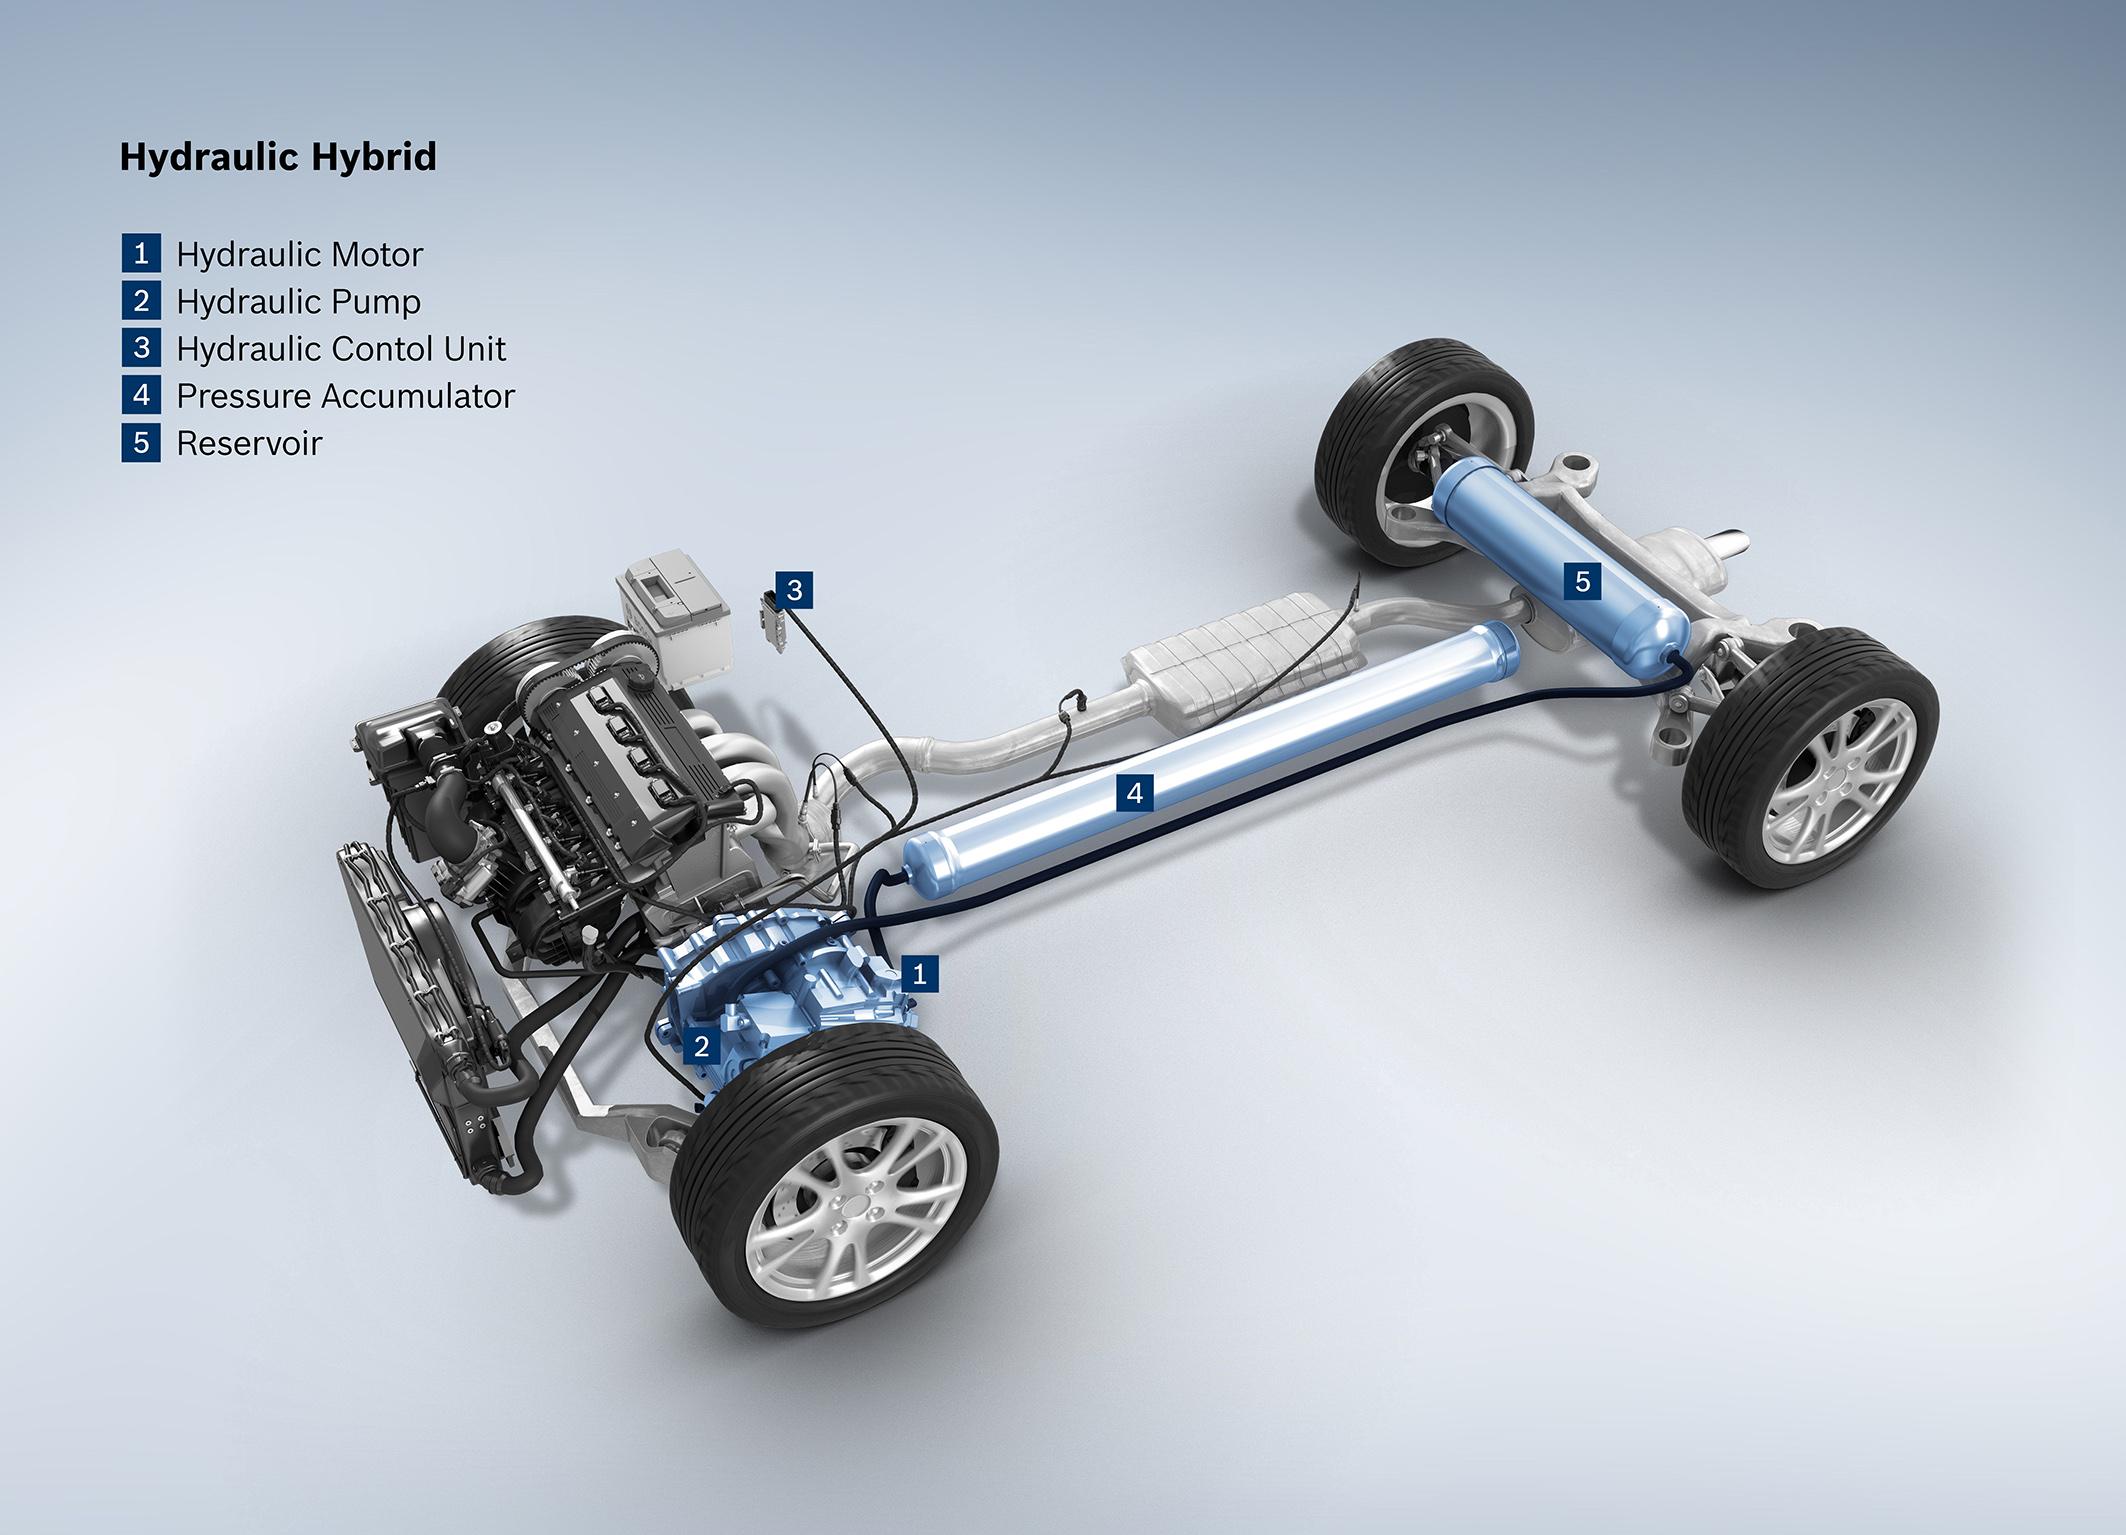 Hydraulic hybrid system overview